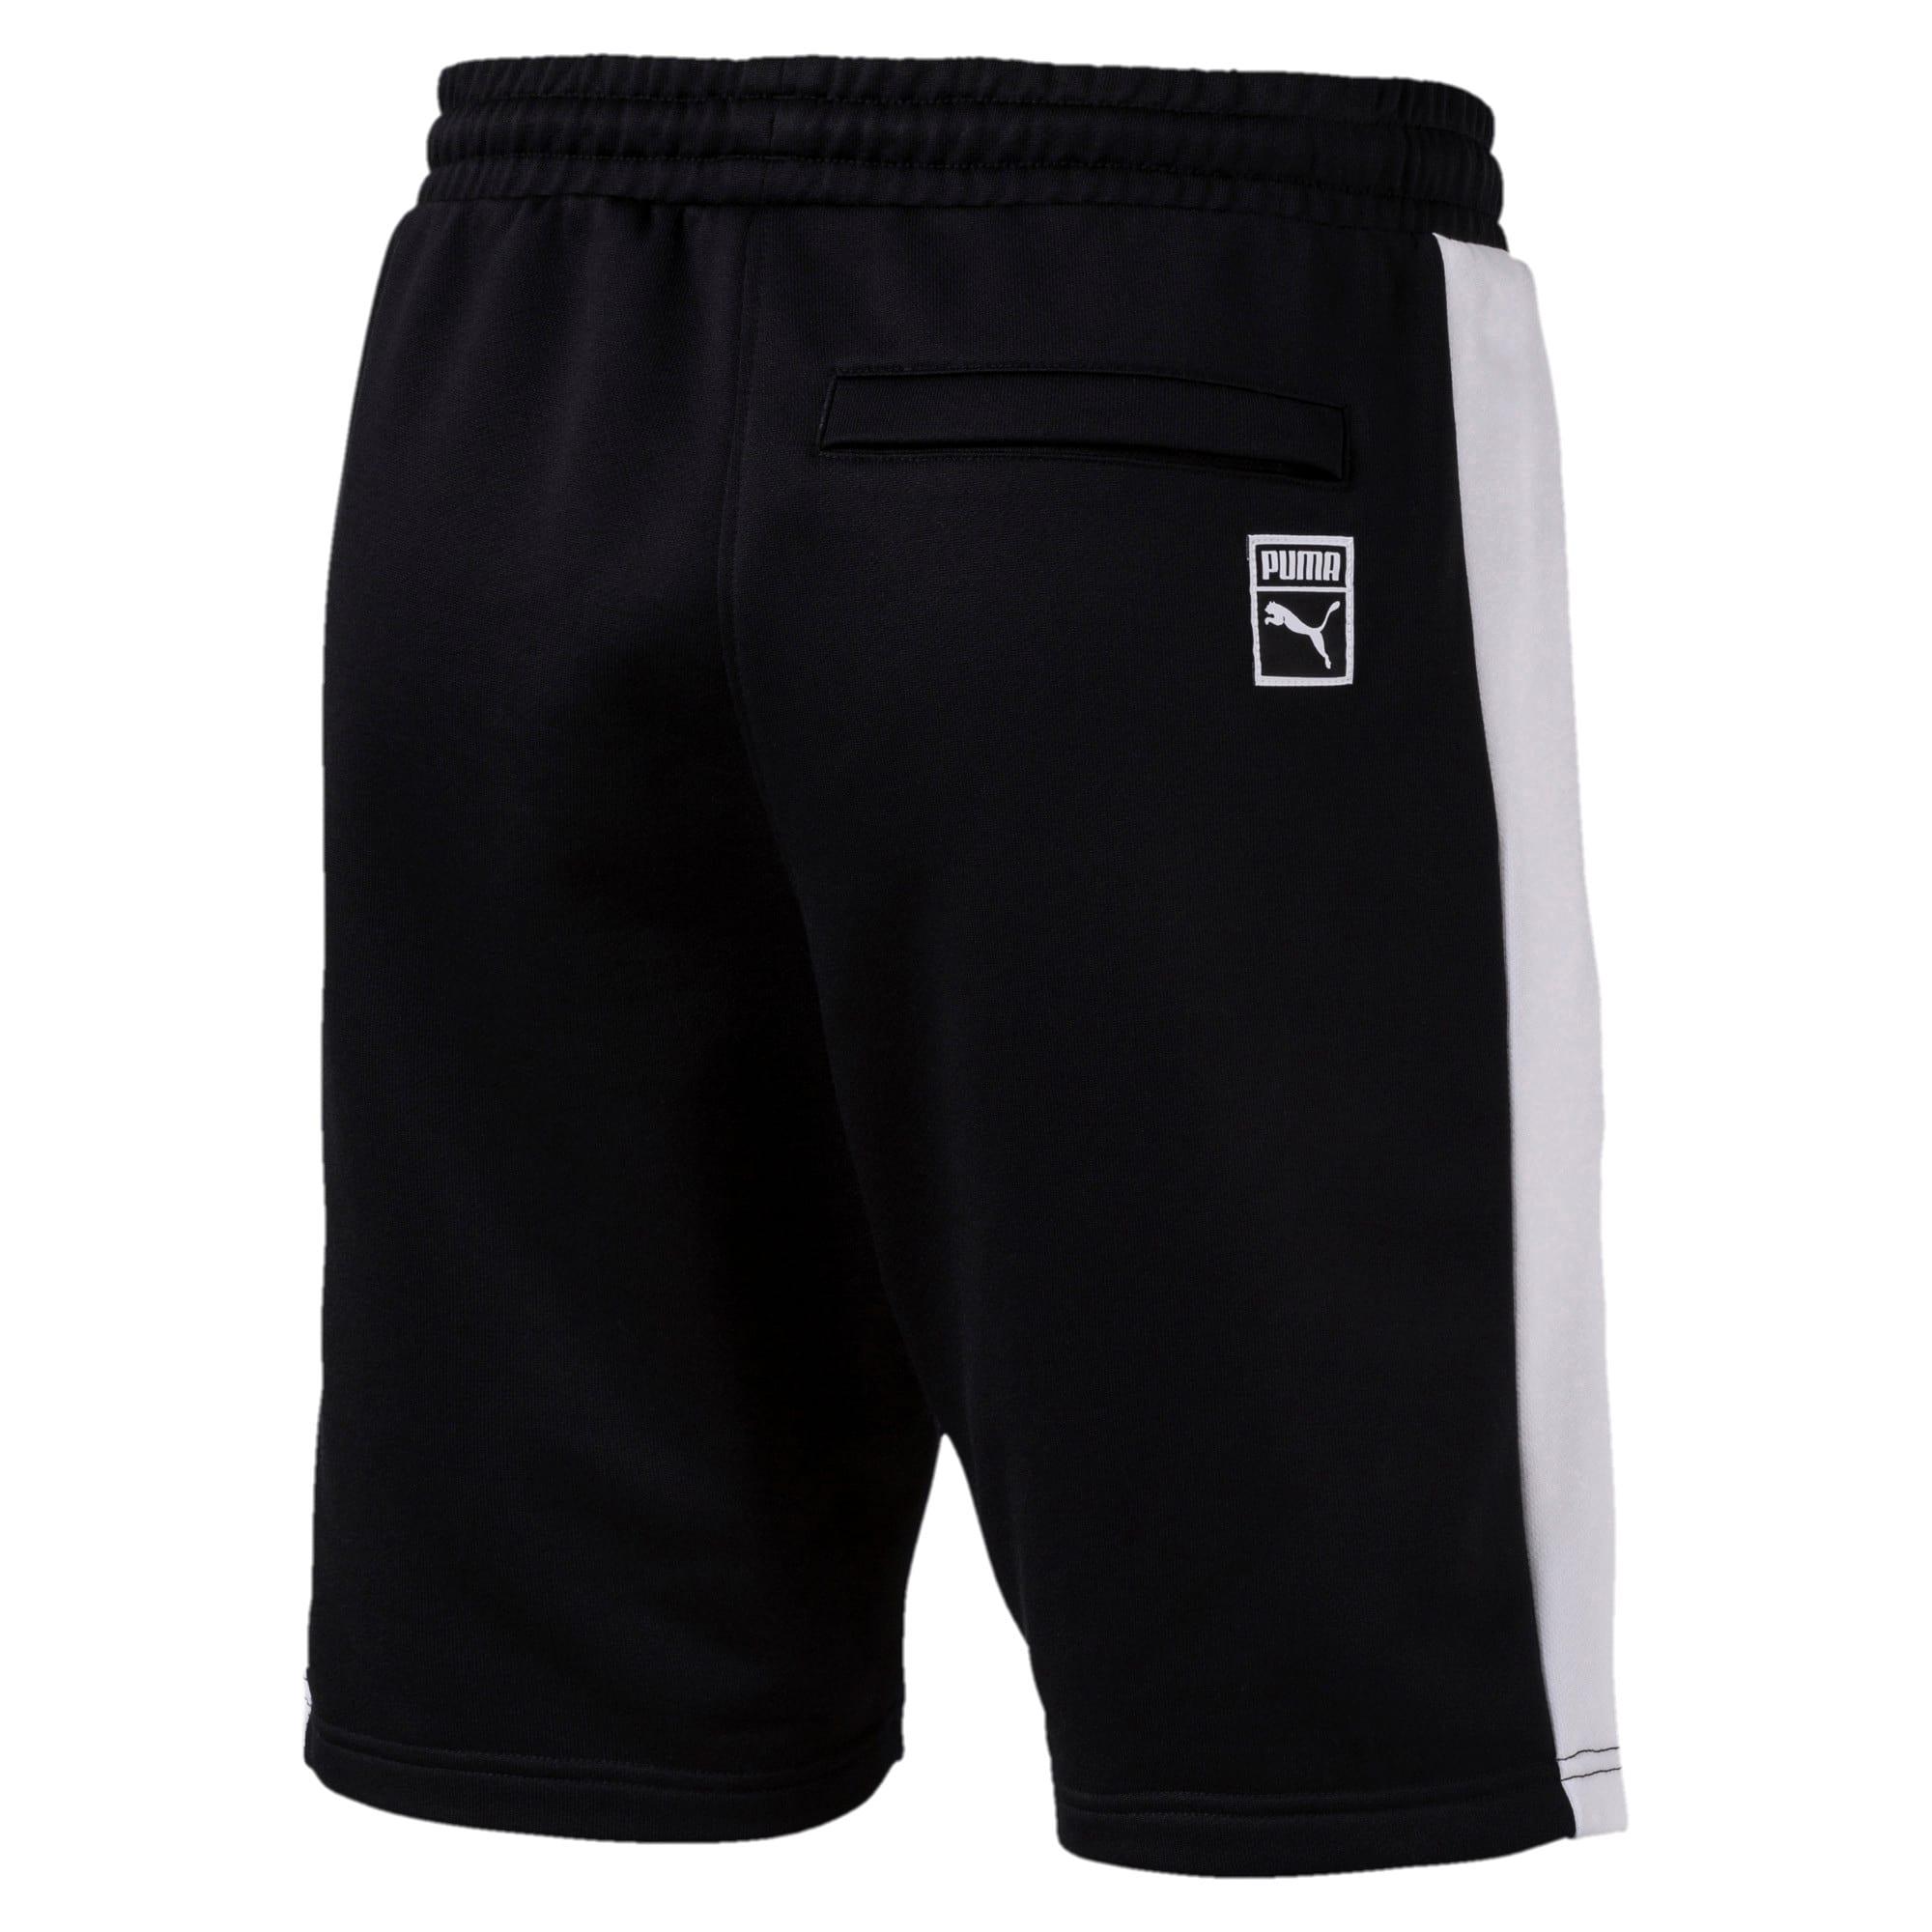 Thumbnail 2 of ArchiveT7 Men's Shorts, Puma Black, medium-IND